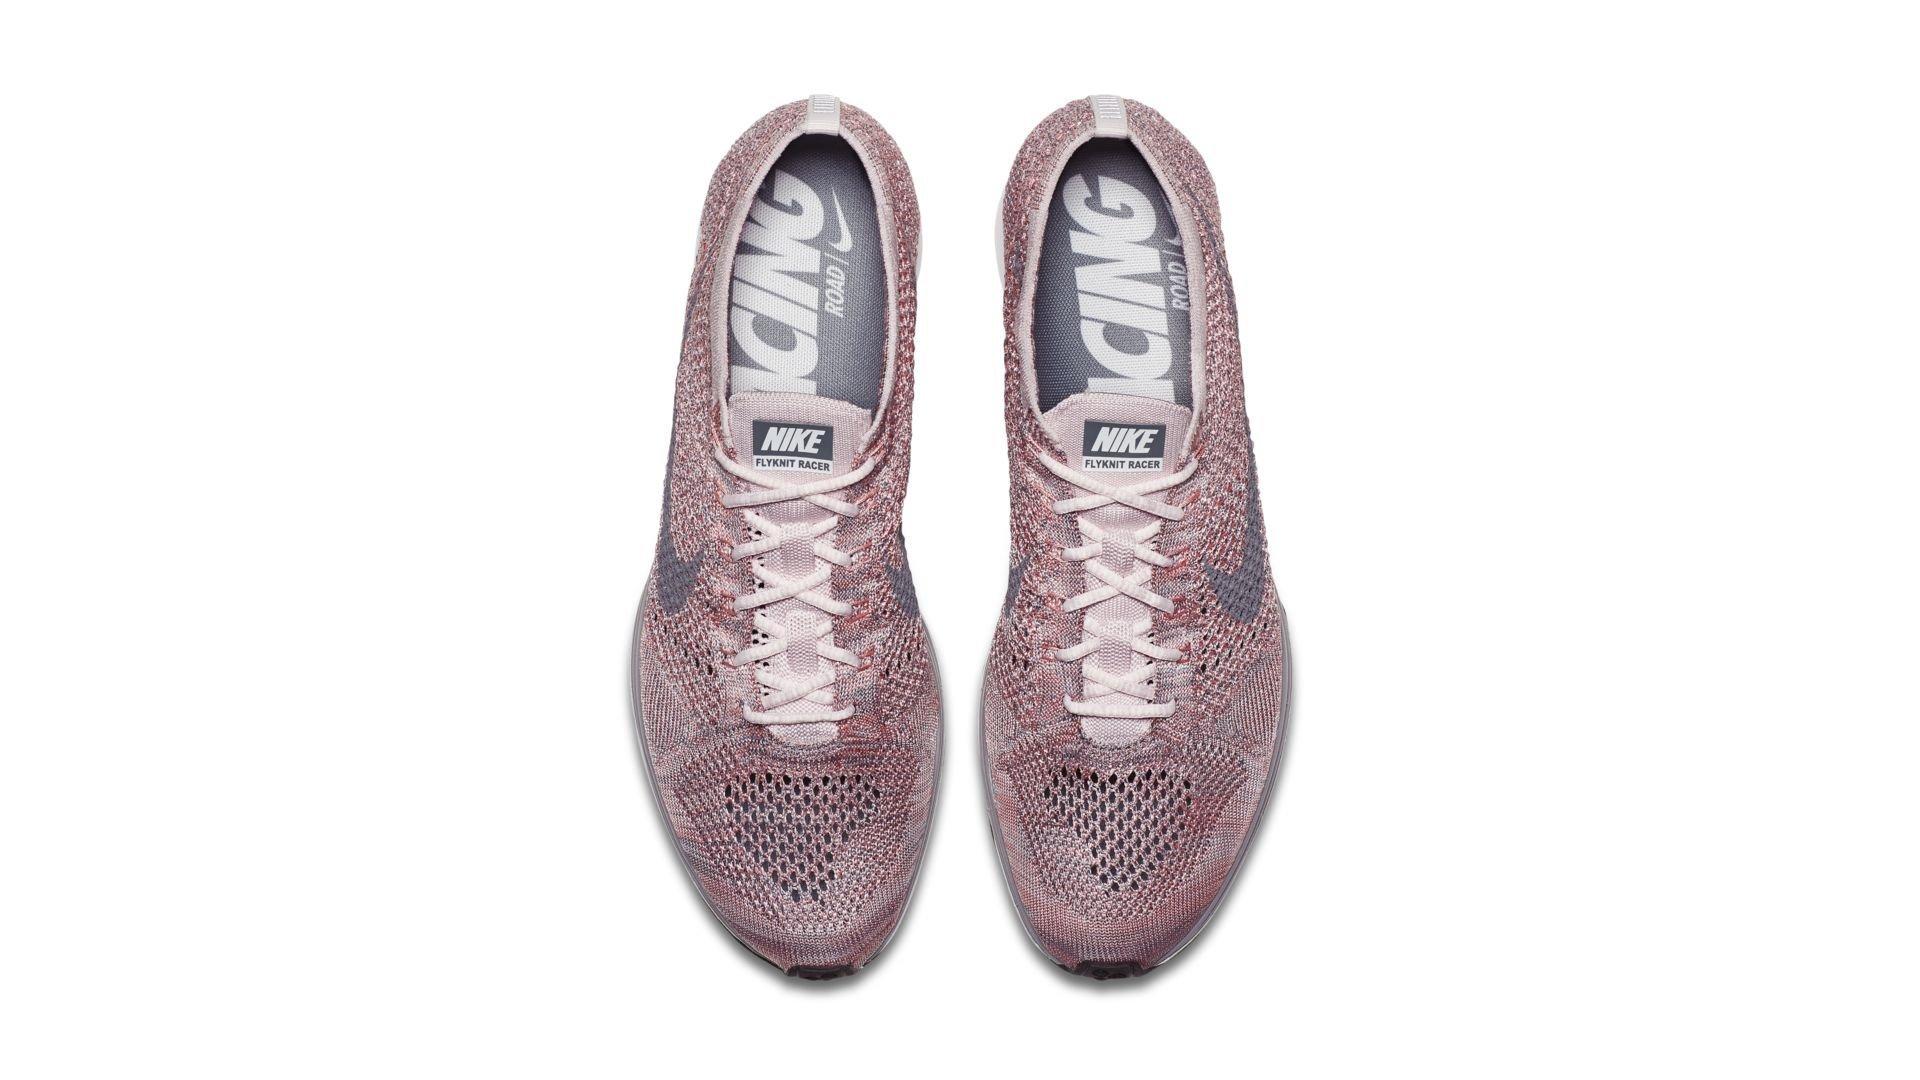 Nike Flyknit Racer Macaron Pack Strawberry (526628-604)